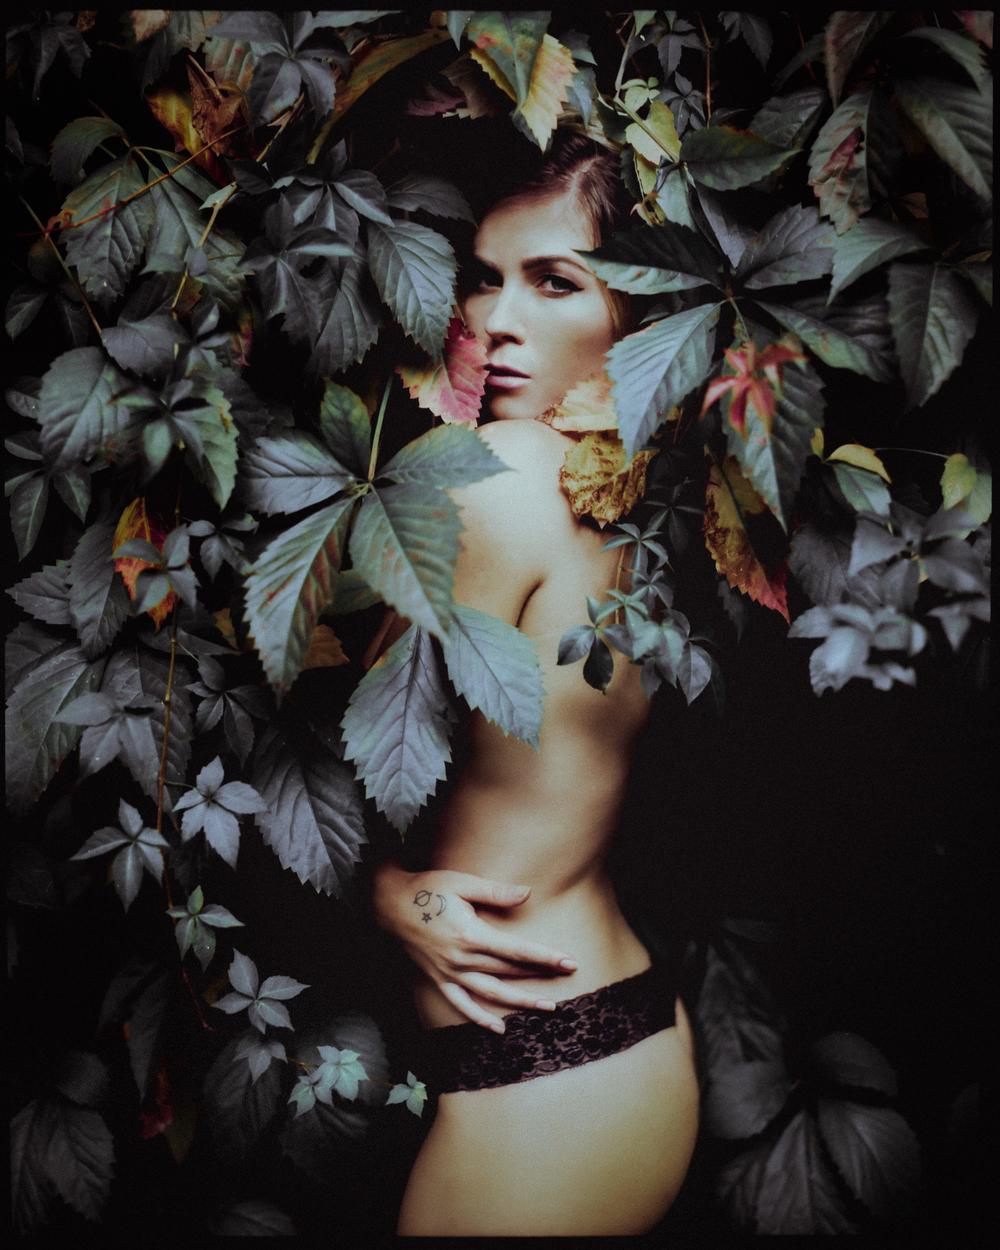 Autumn Garden Model: Ama  Sylist: GIAN